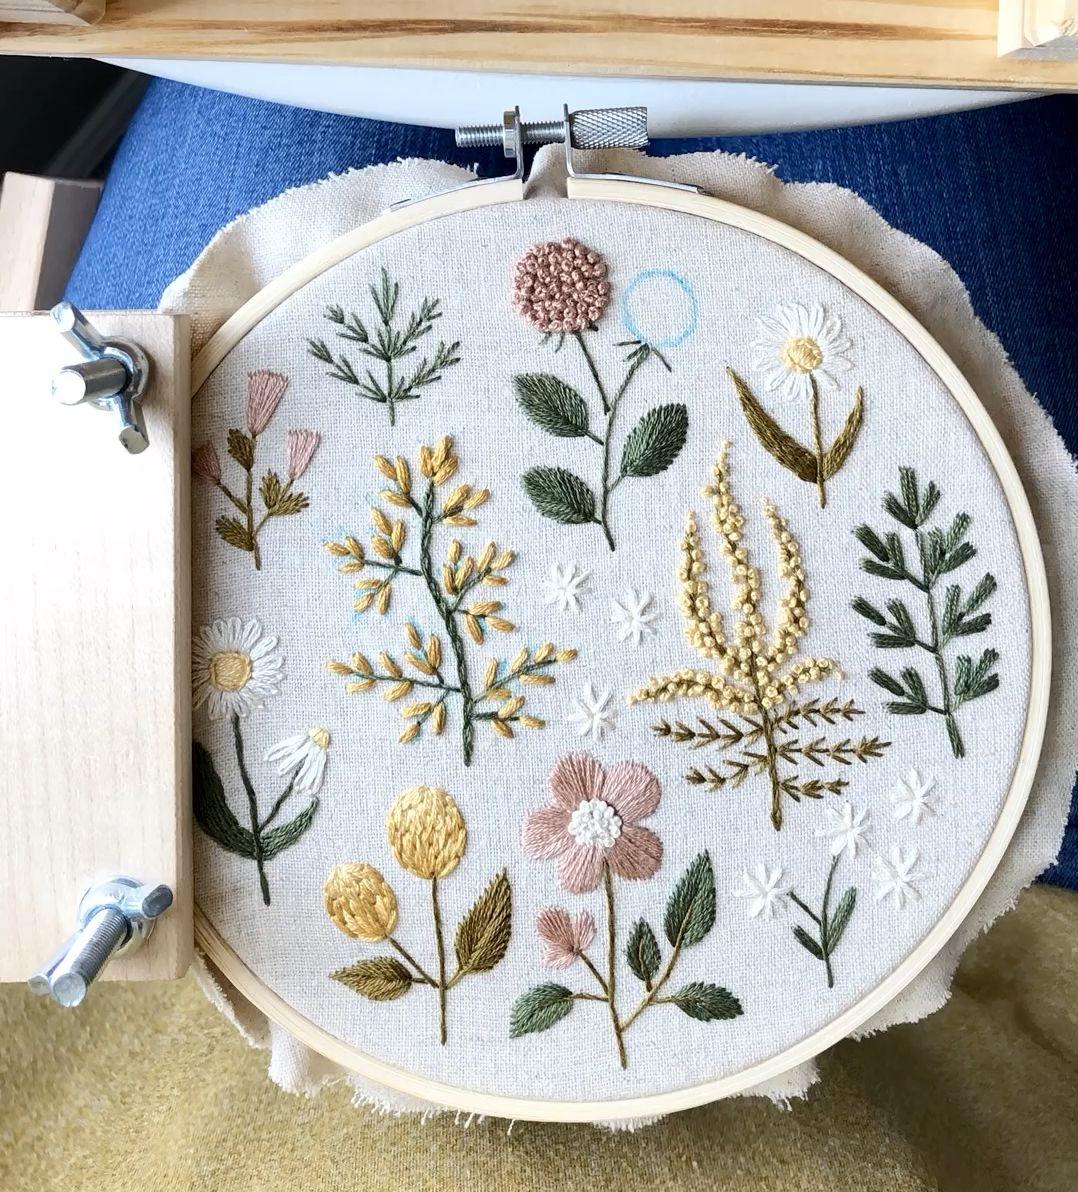 Botanical hand embroidery